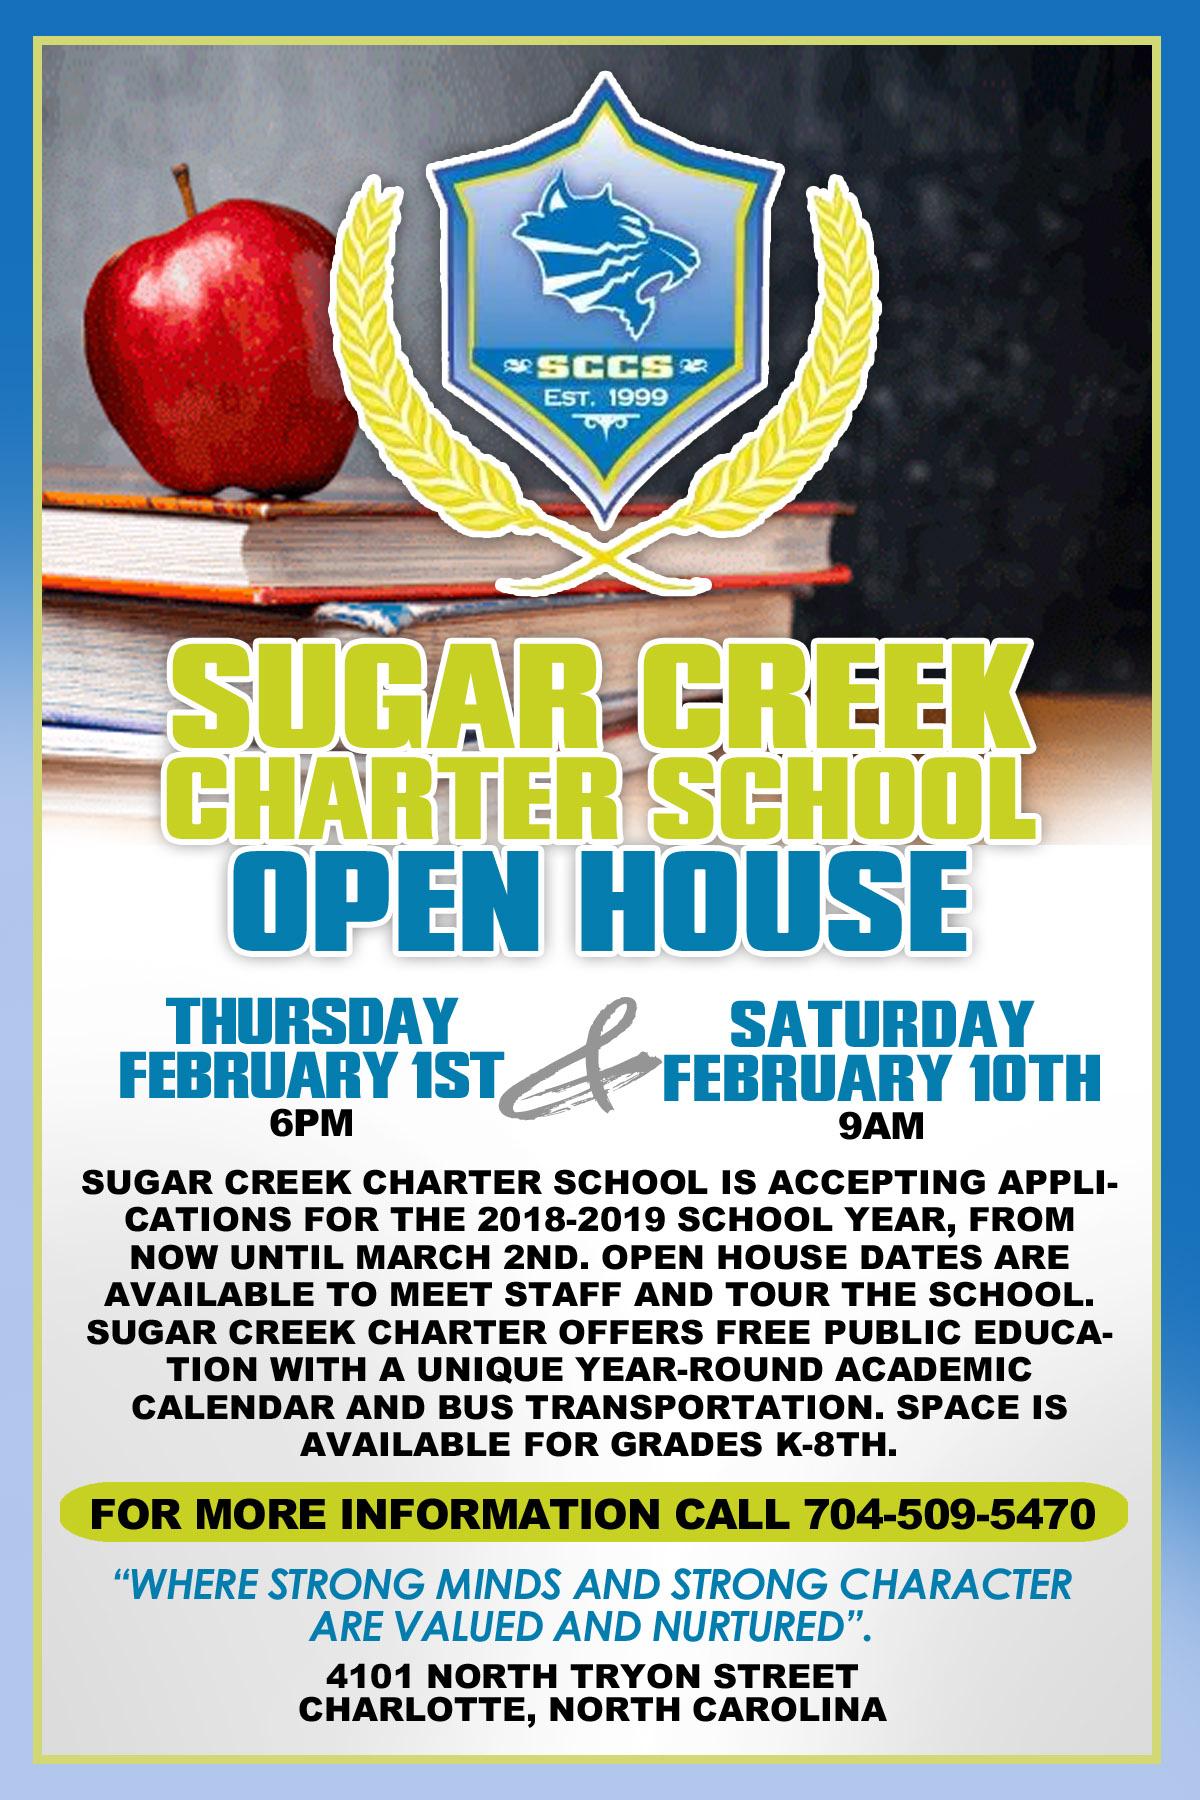 Sugar Creek Charter School